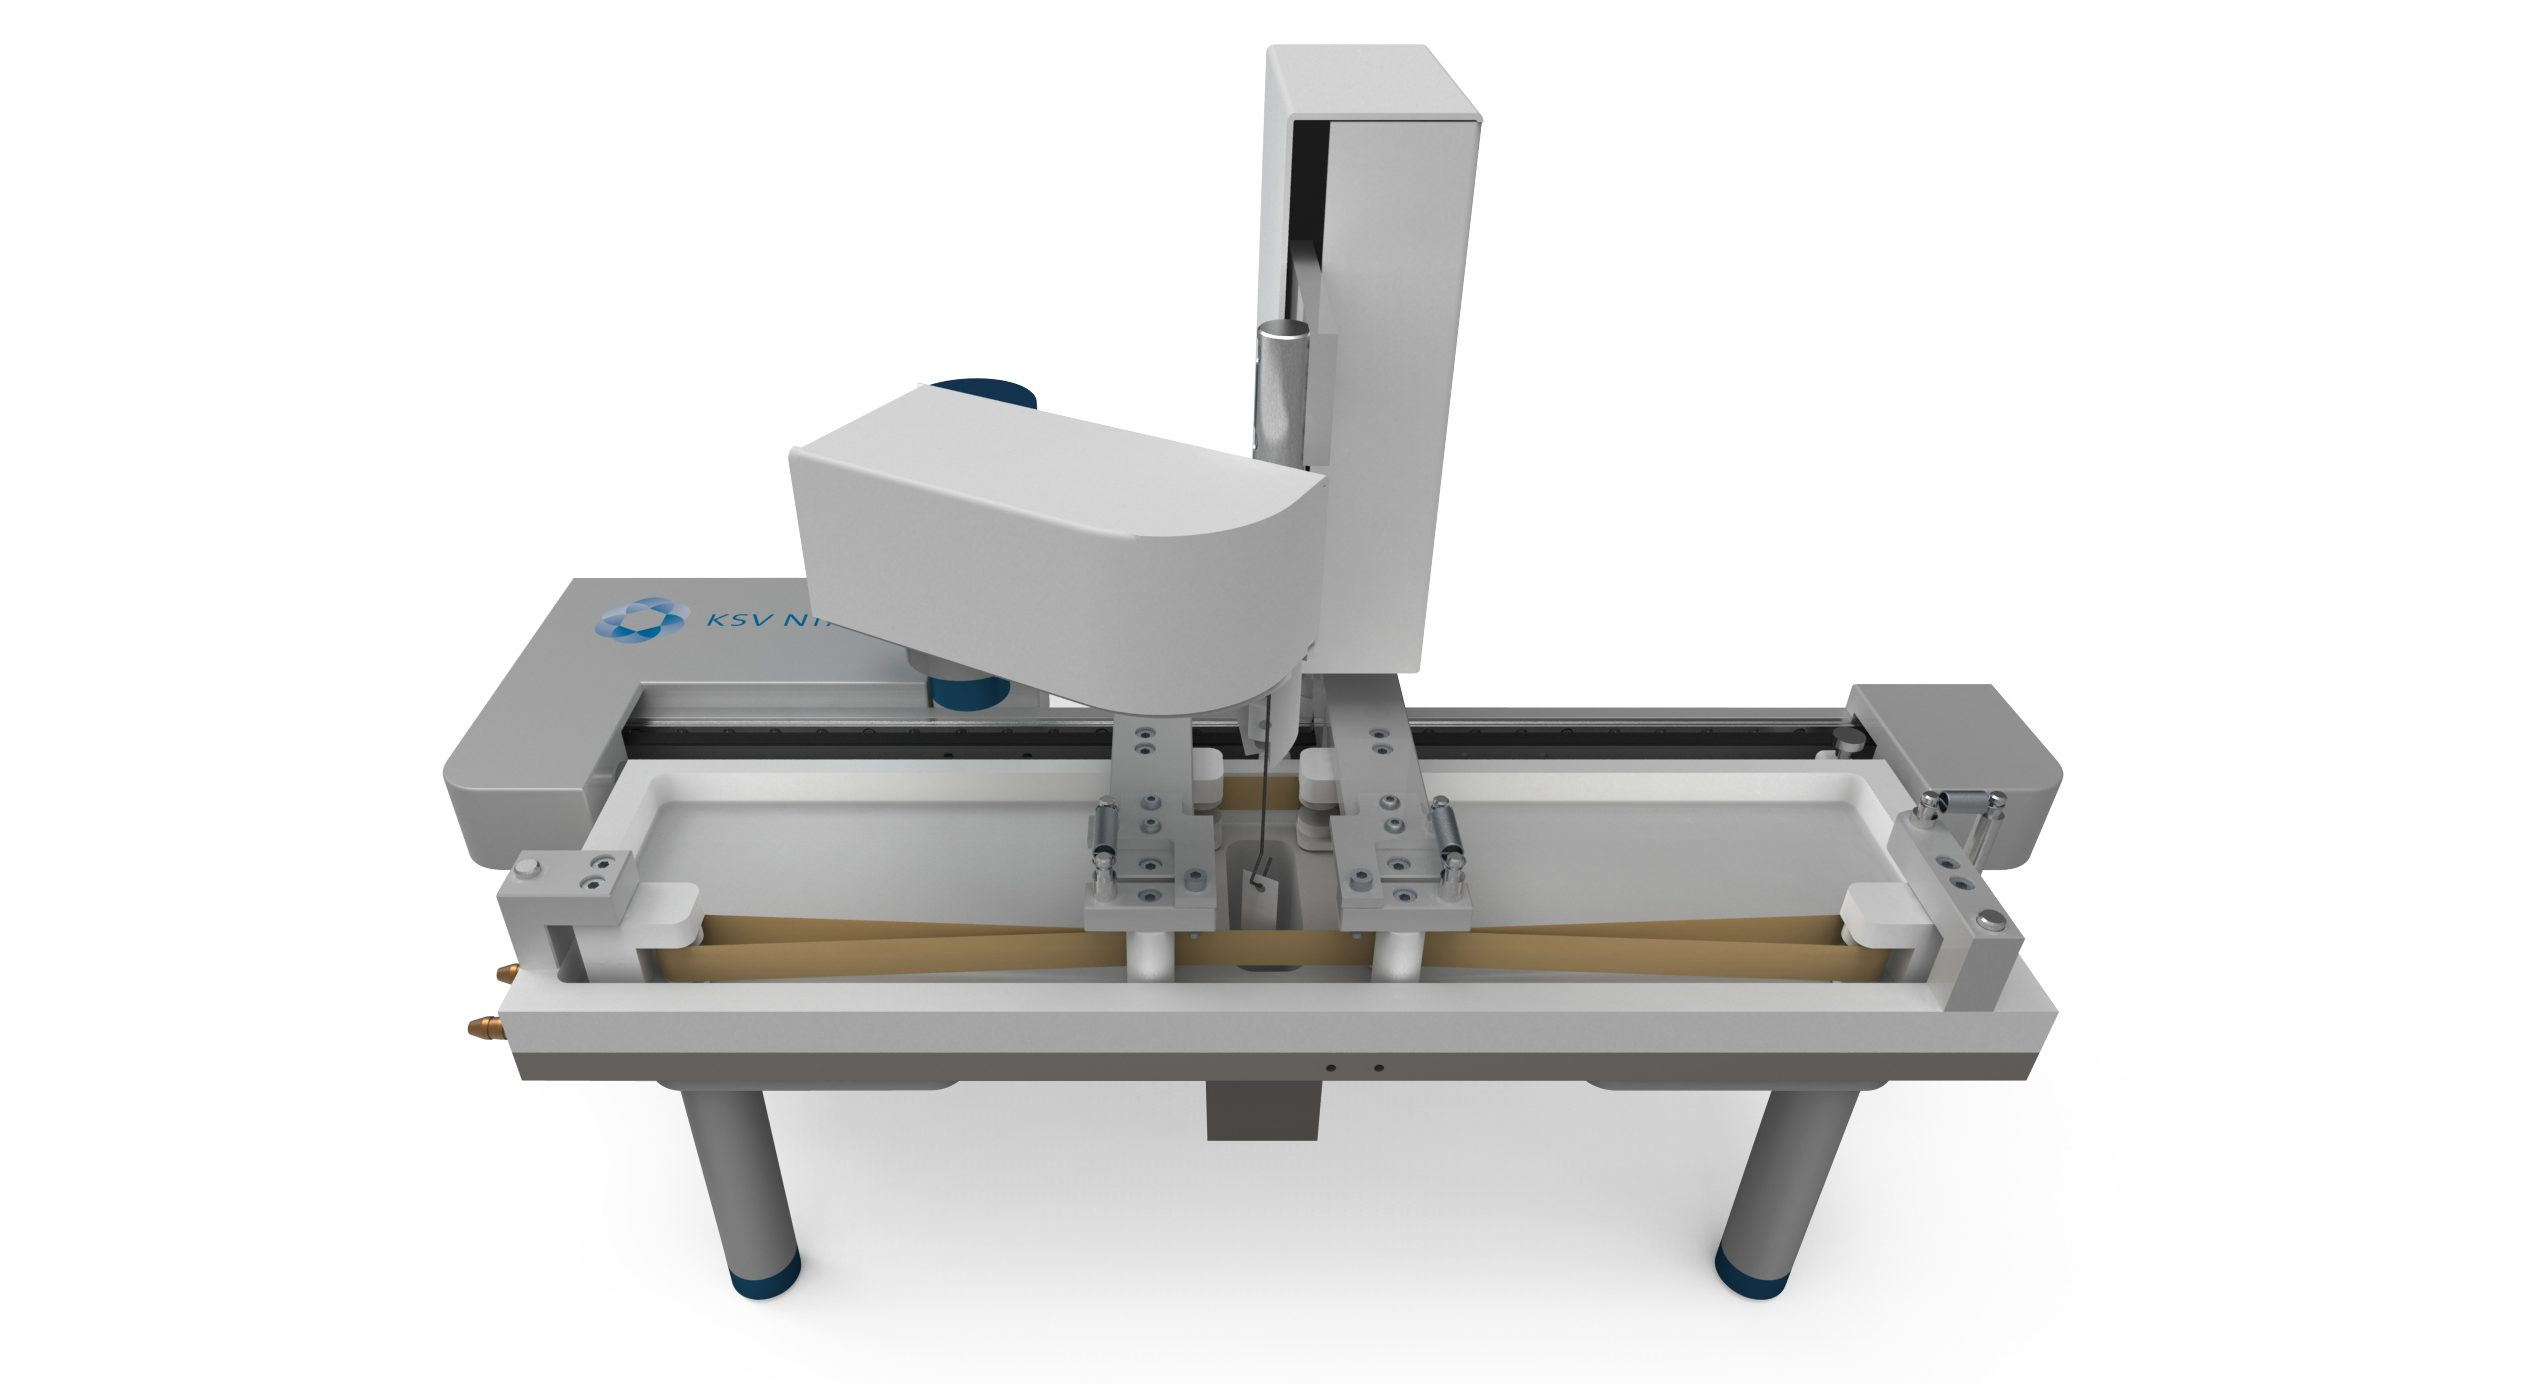 Product Image of the KSV NIMA Langmuir Ribbon Barrier Trough